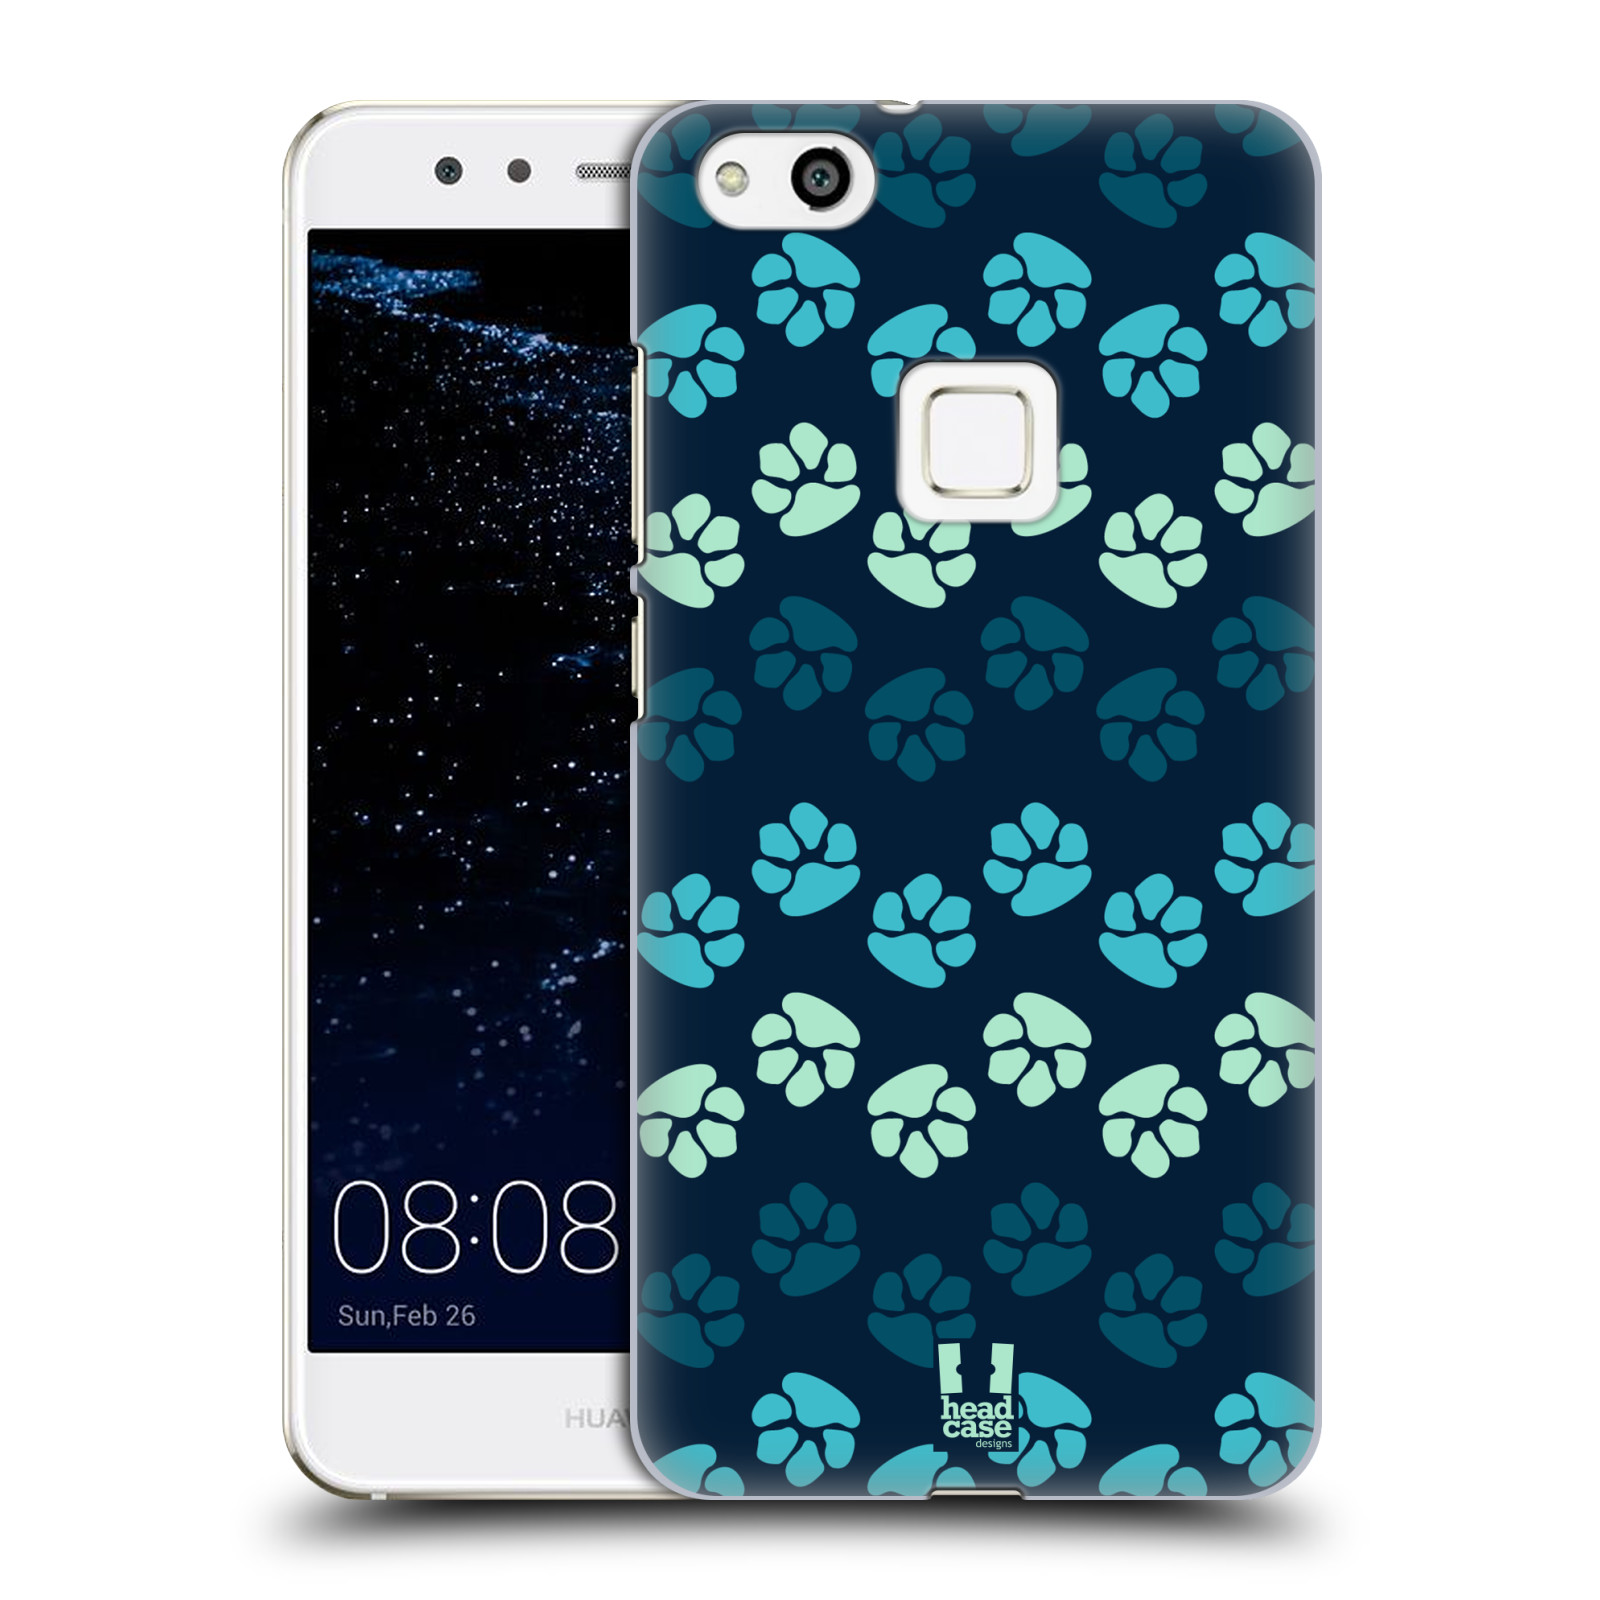 Plastové pouzdro na mobil Huawei P10 Lite Head Case - TLAPKY MODRÉ (Plastový kryt či obal na mobilní telefon Huawei P10 Lite Dual SIM (LX1/LX1A))